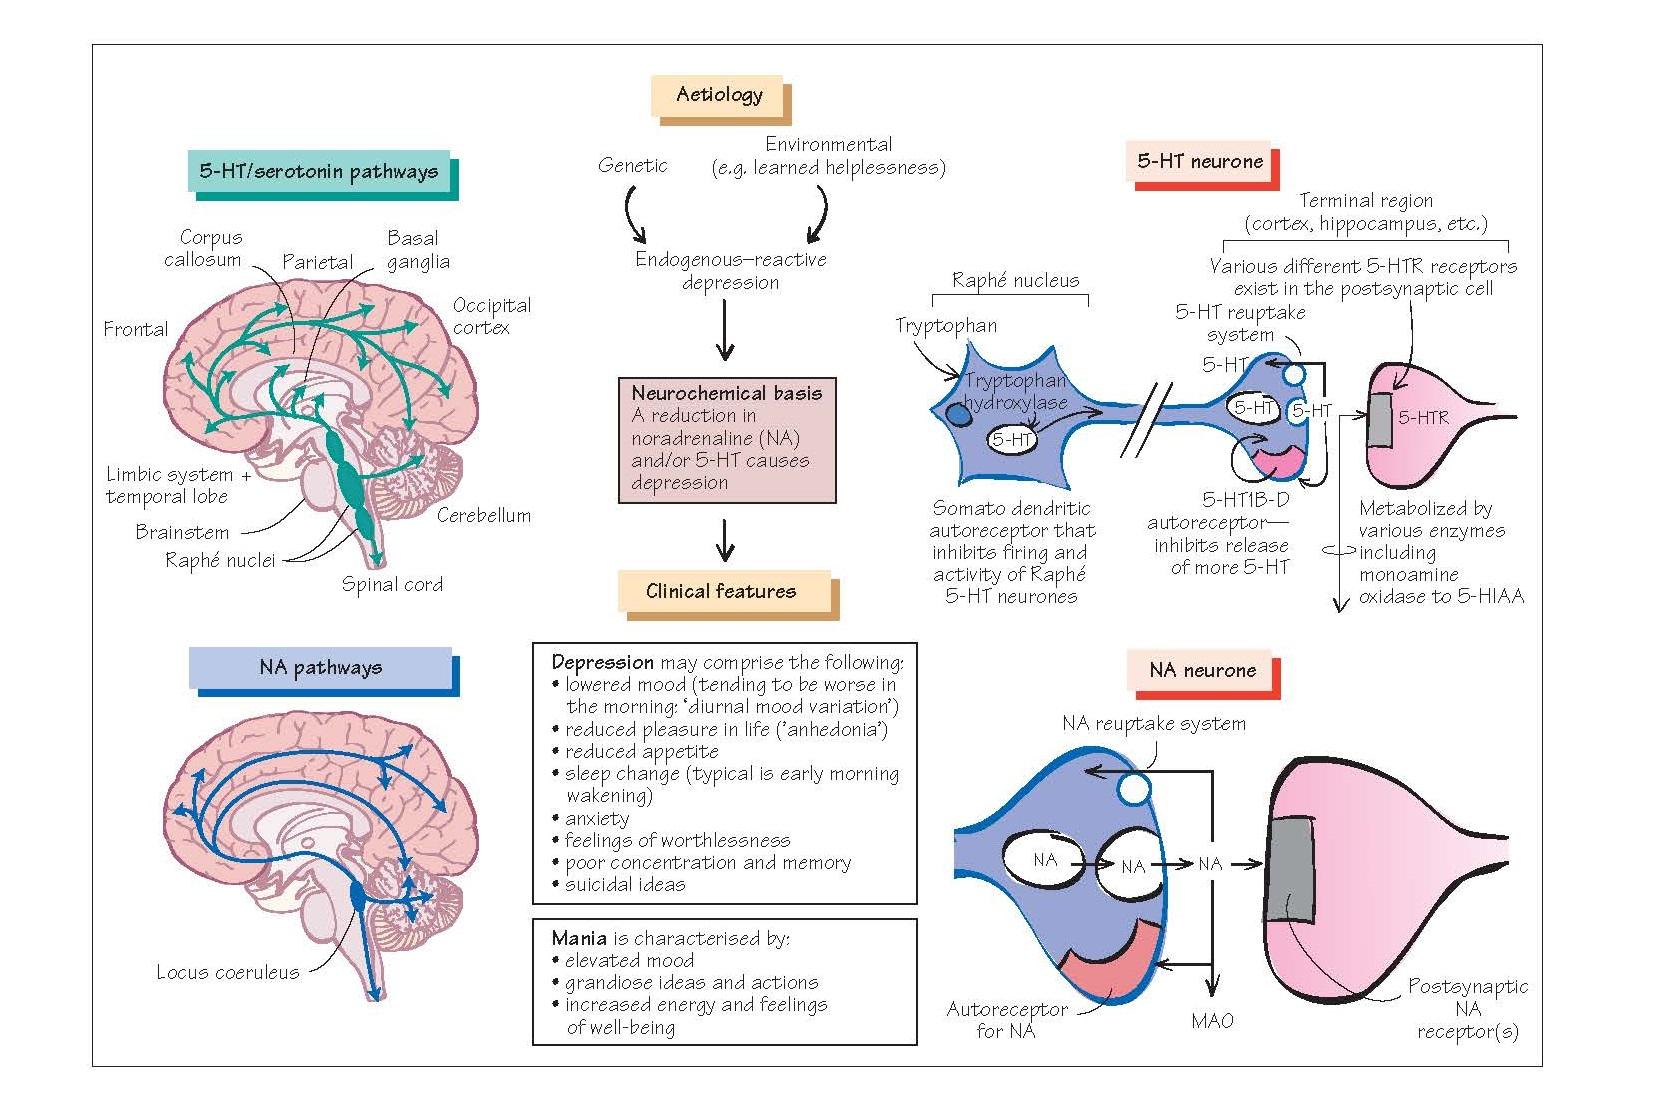 Neurochemical basis of depression